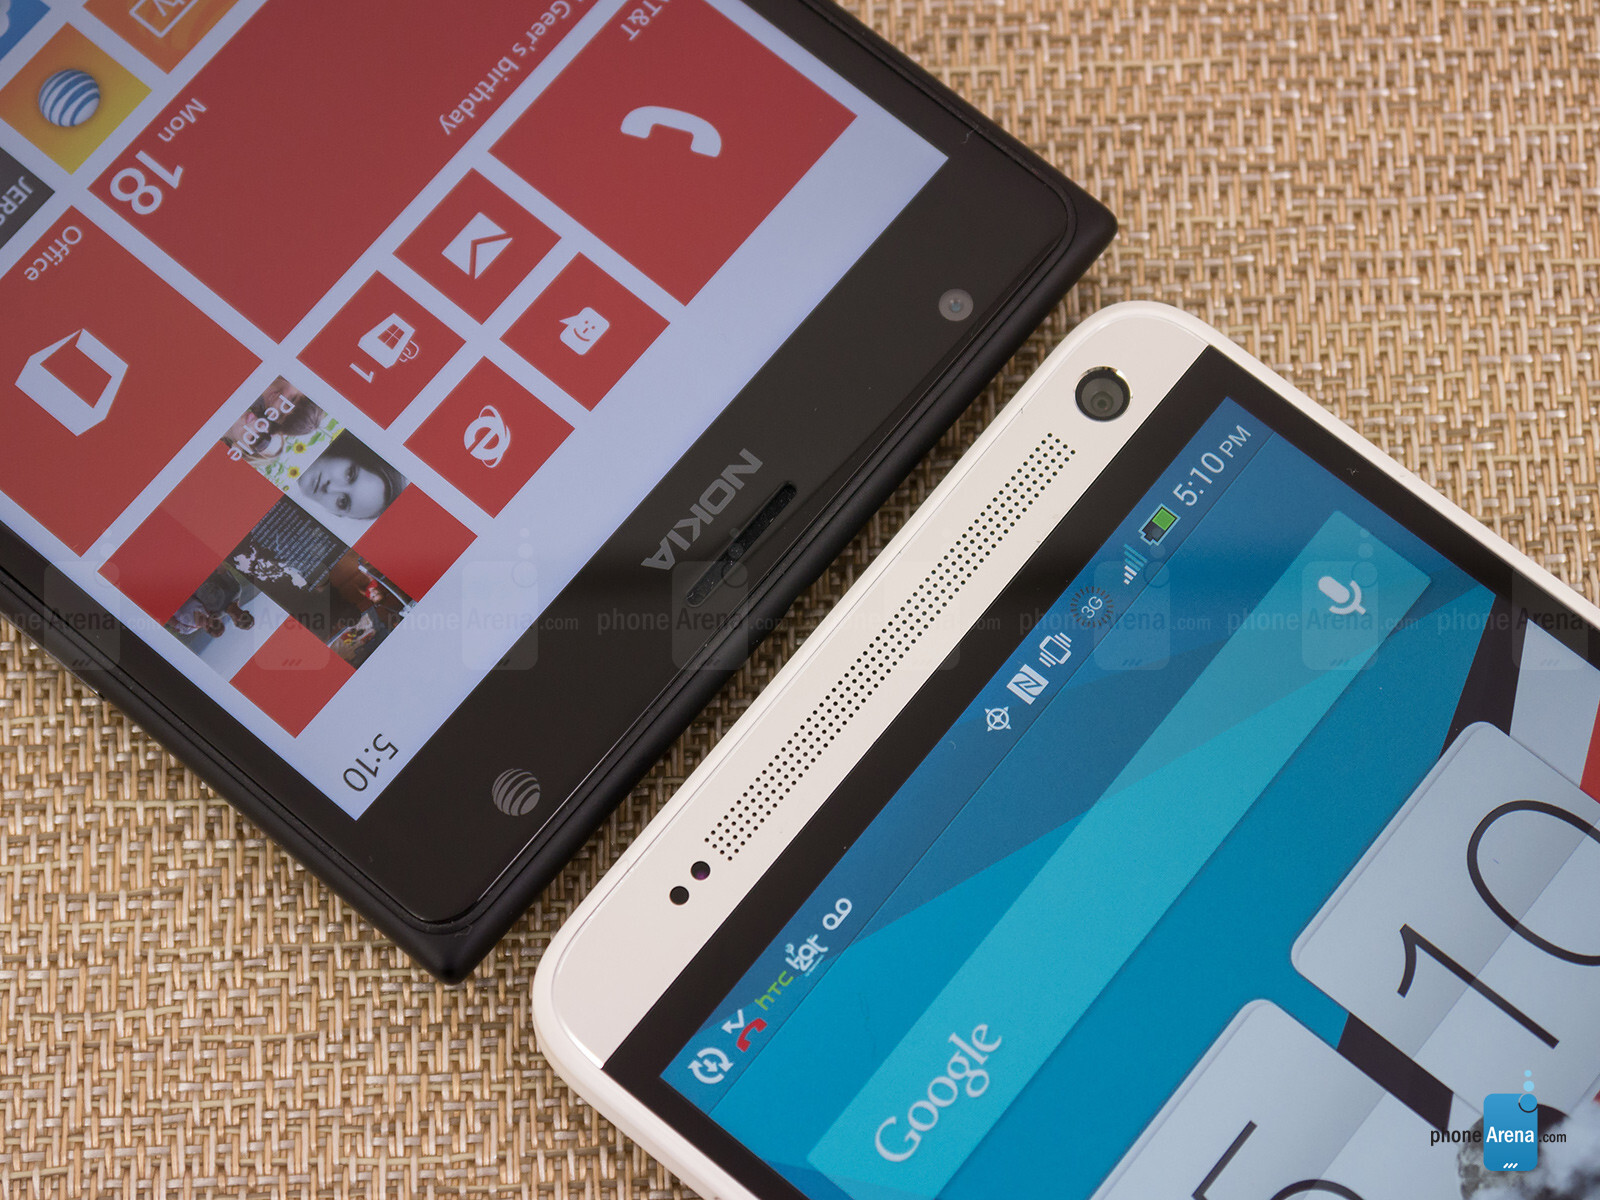 Emancipation lumia 1520 vs htc one max device available